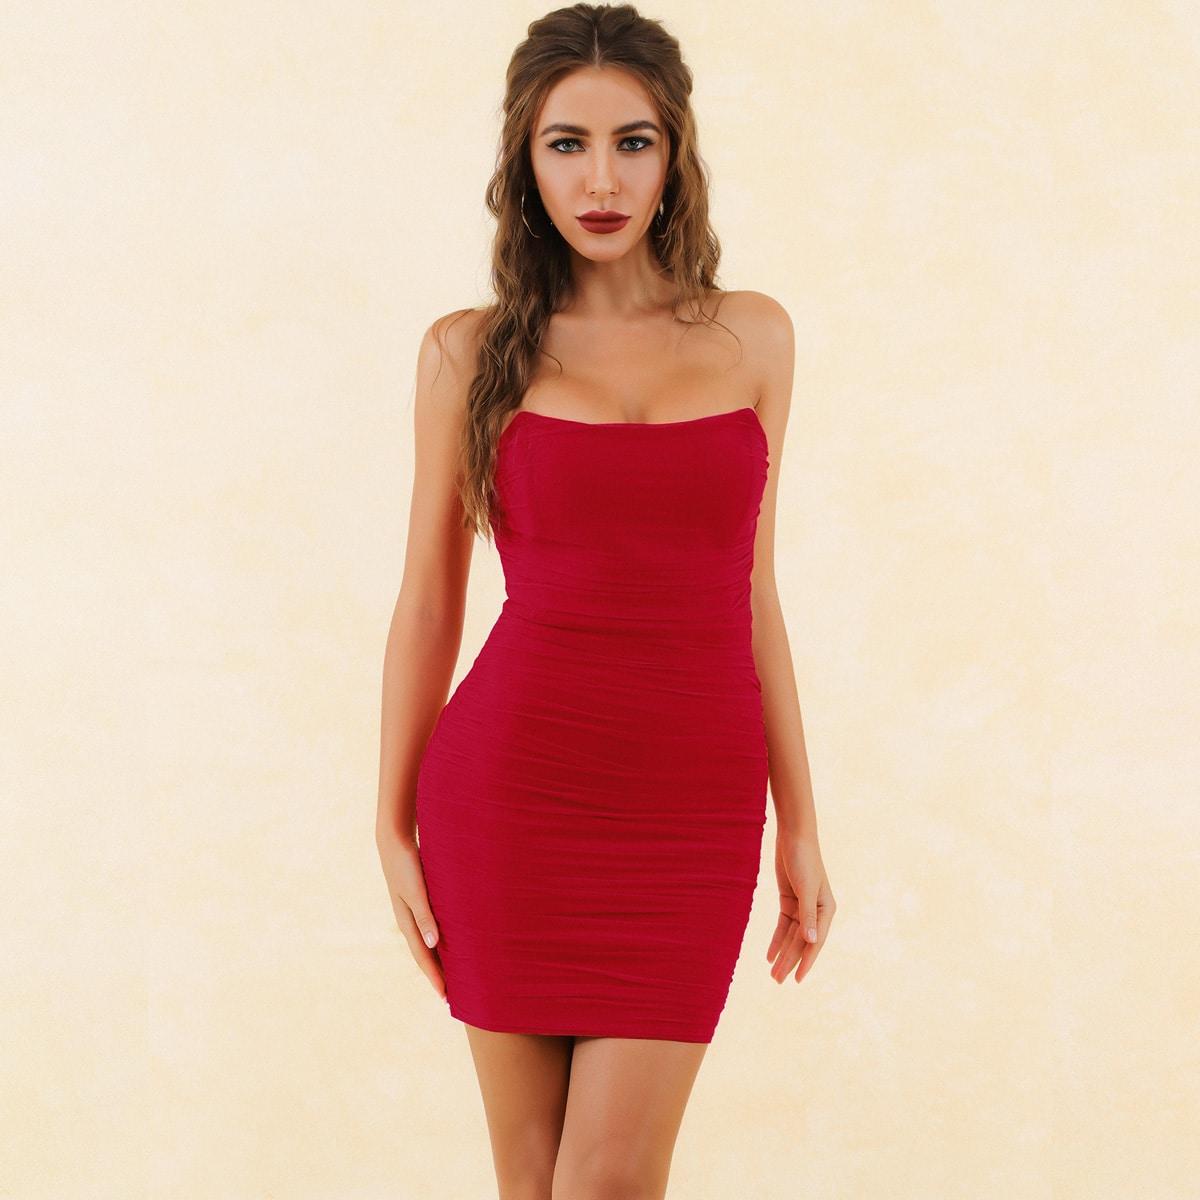 Lucra Сетчатое платье без бретелек